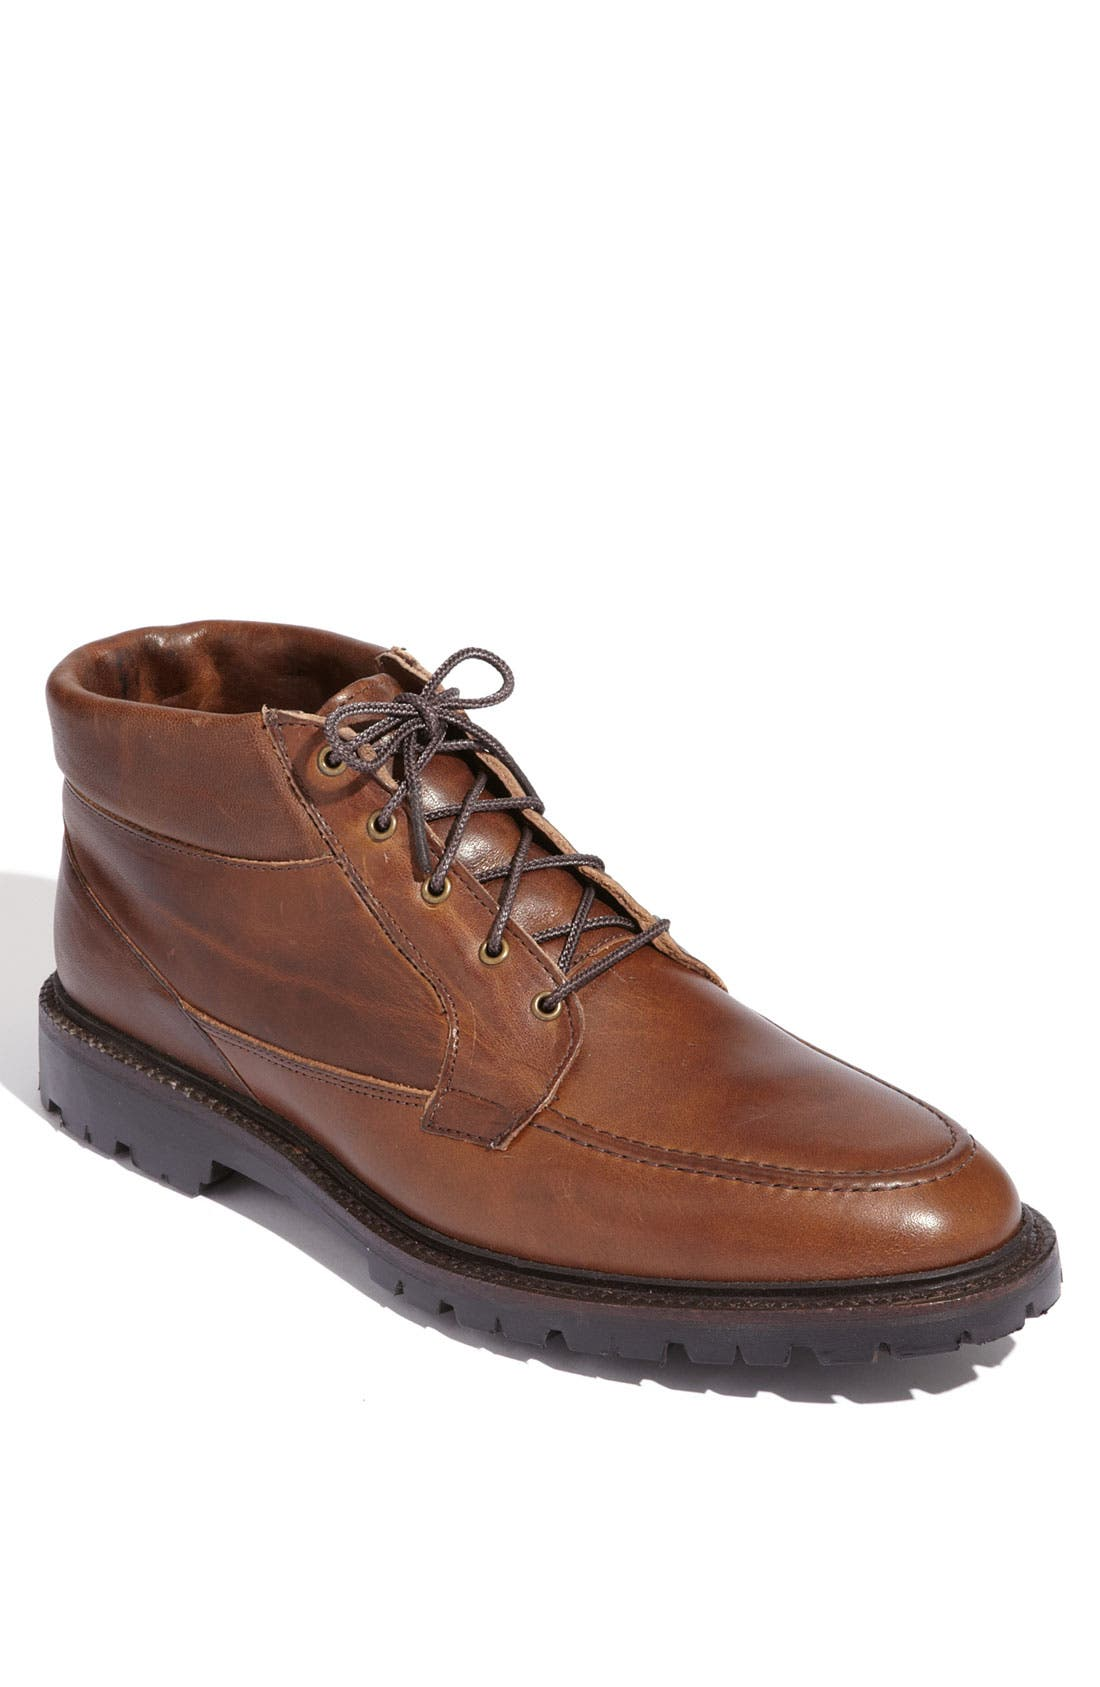 Alternate Image 1 Selected - Allen Edmonds 'Cascade' Boot